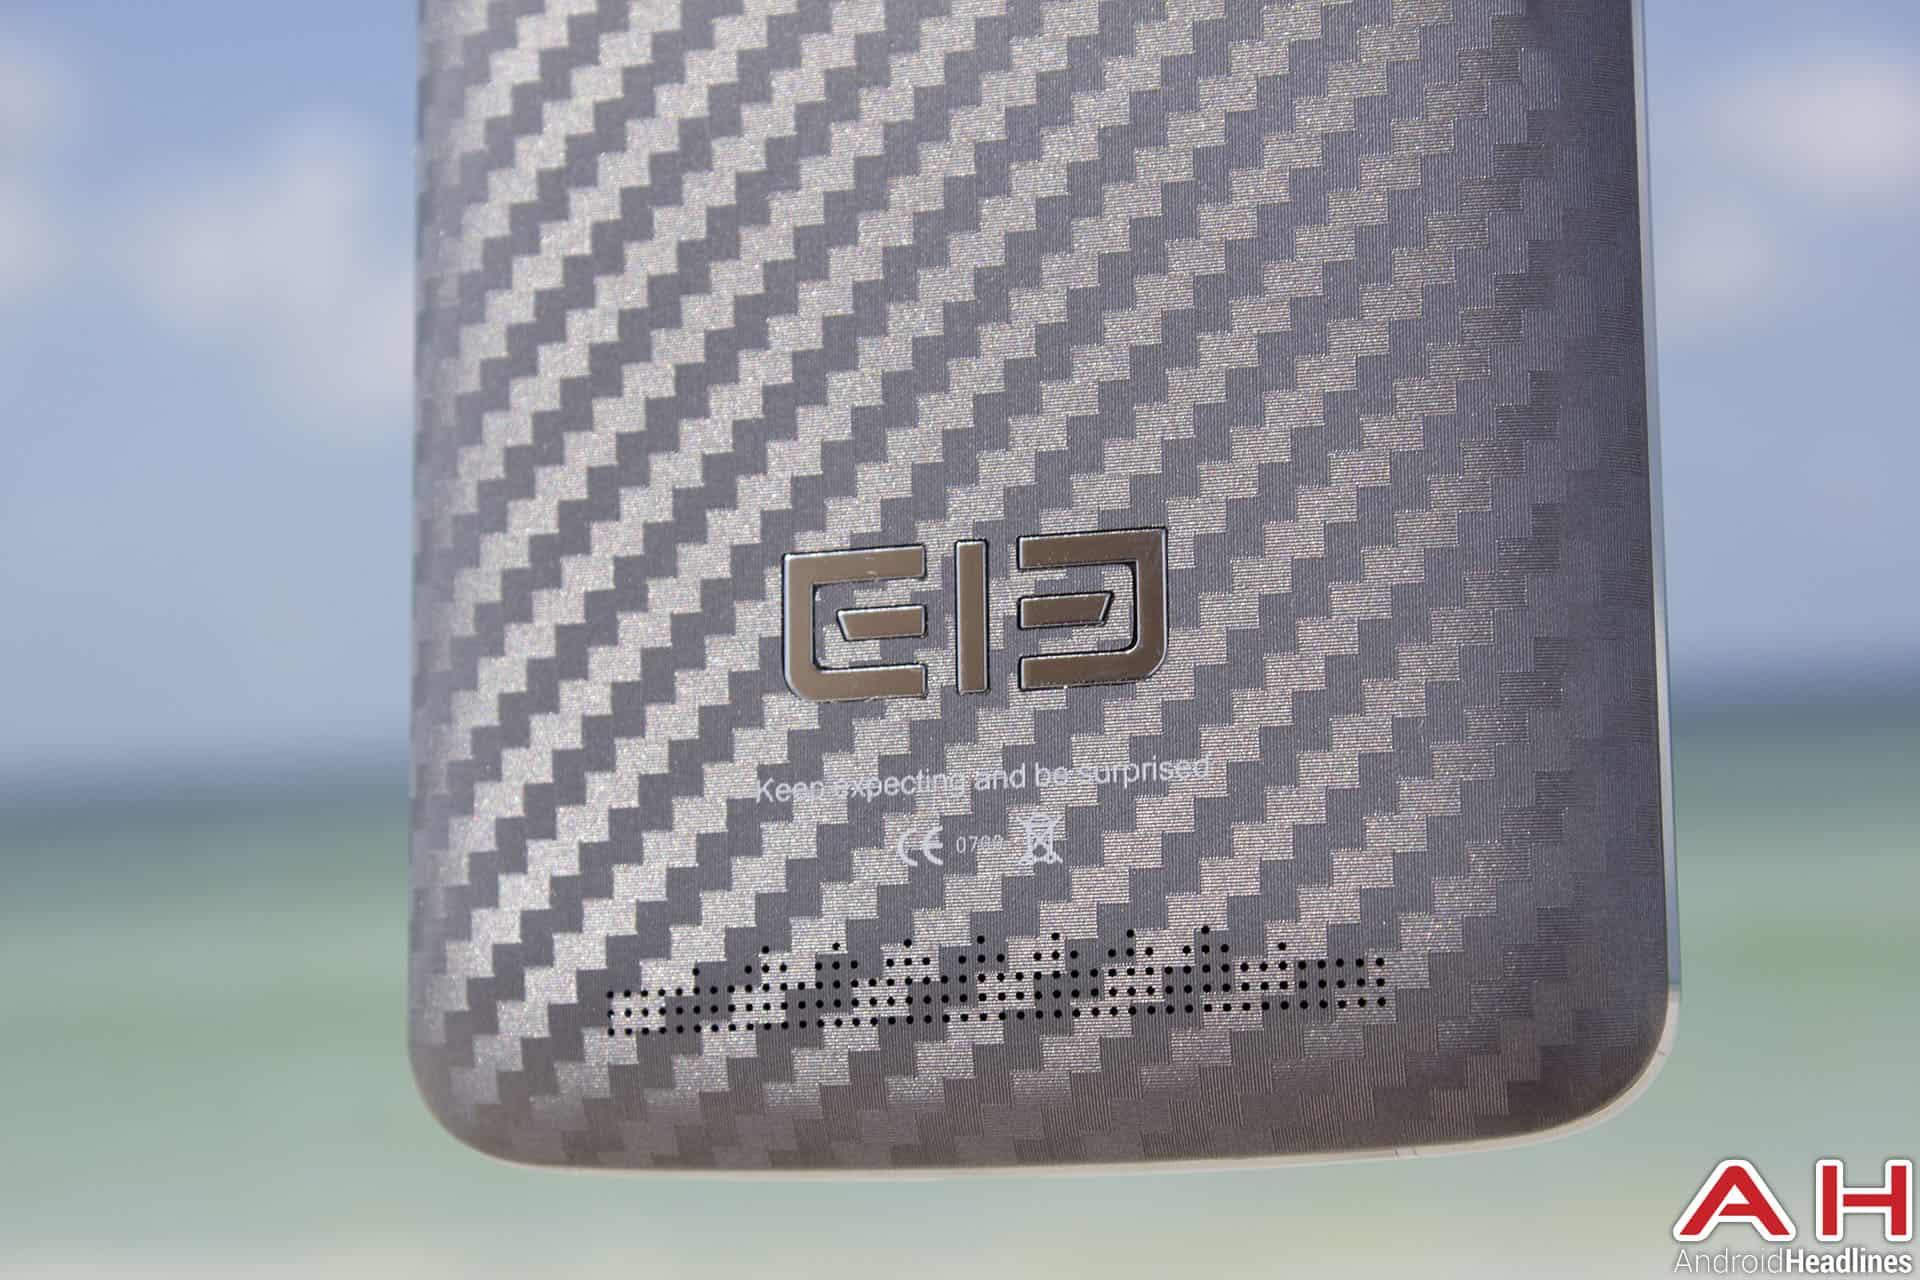 elephone-p8000-review-AH-logo-3